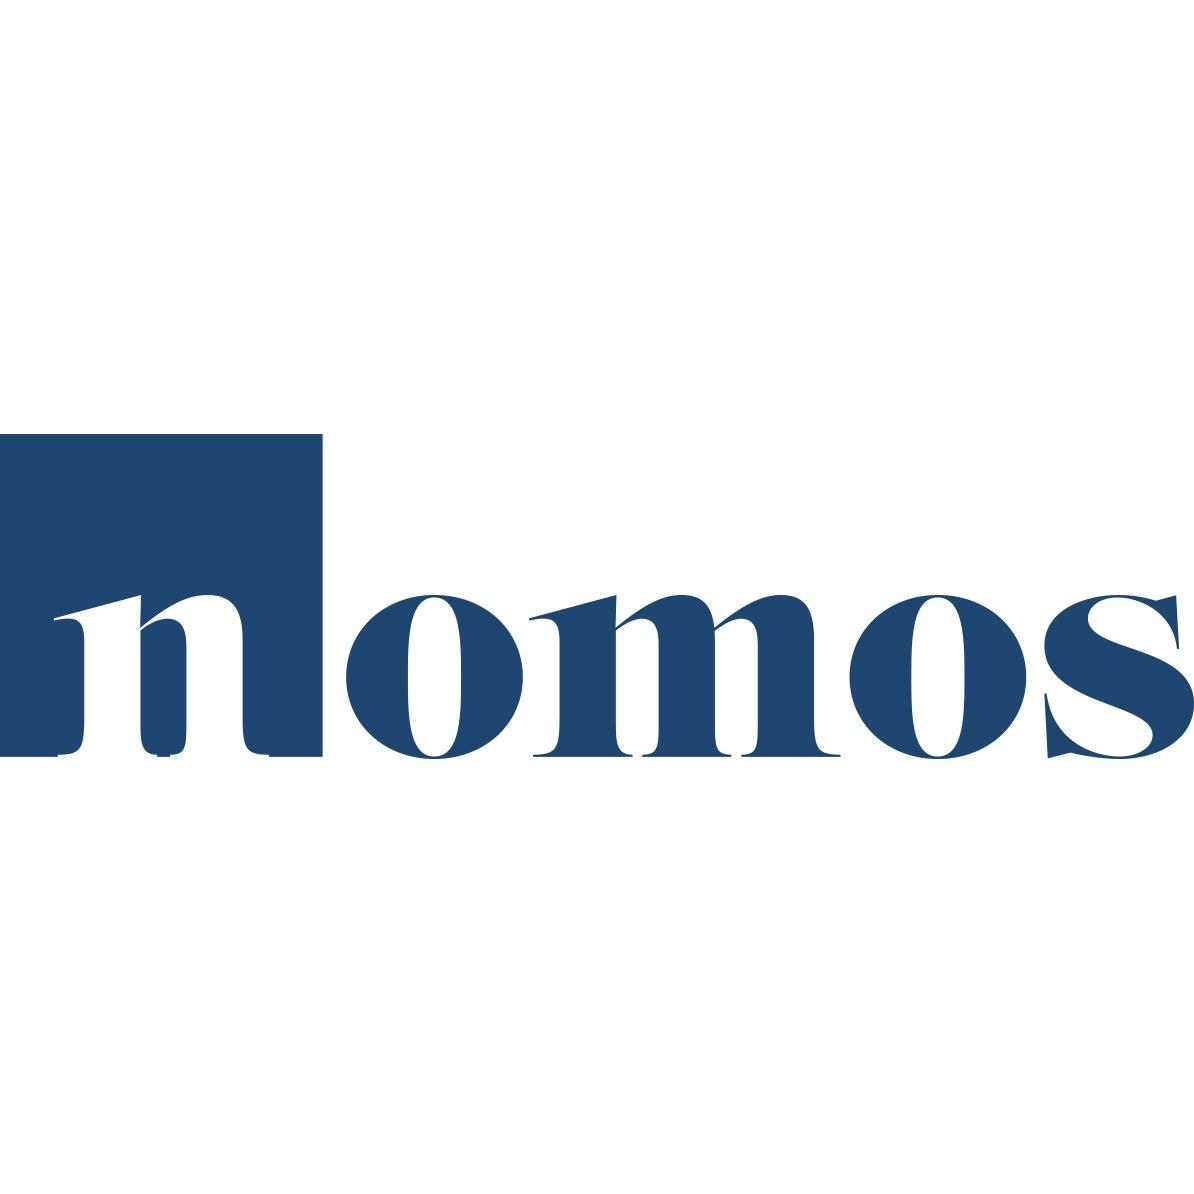 the Nomos logo.